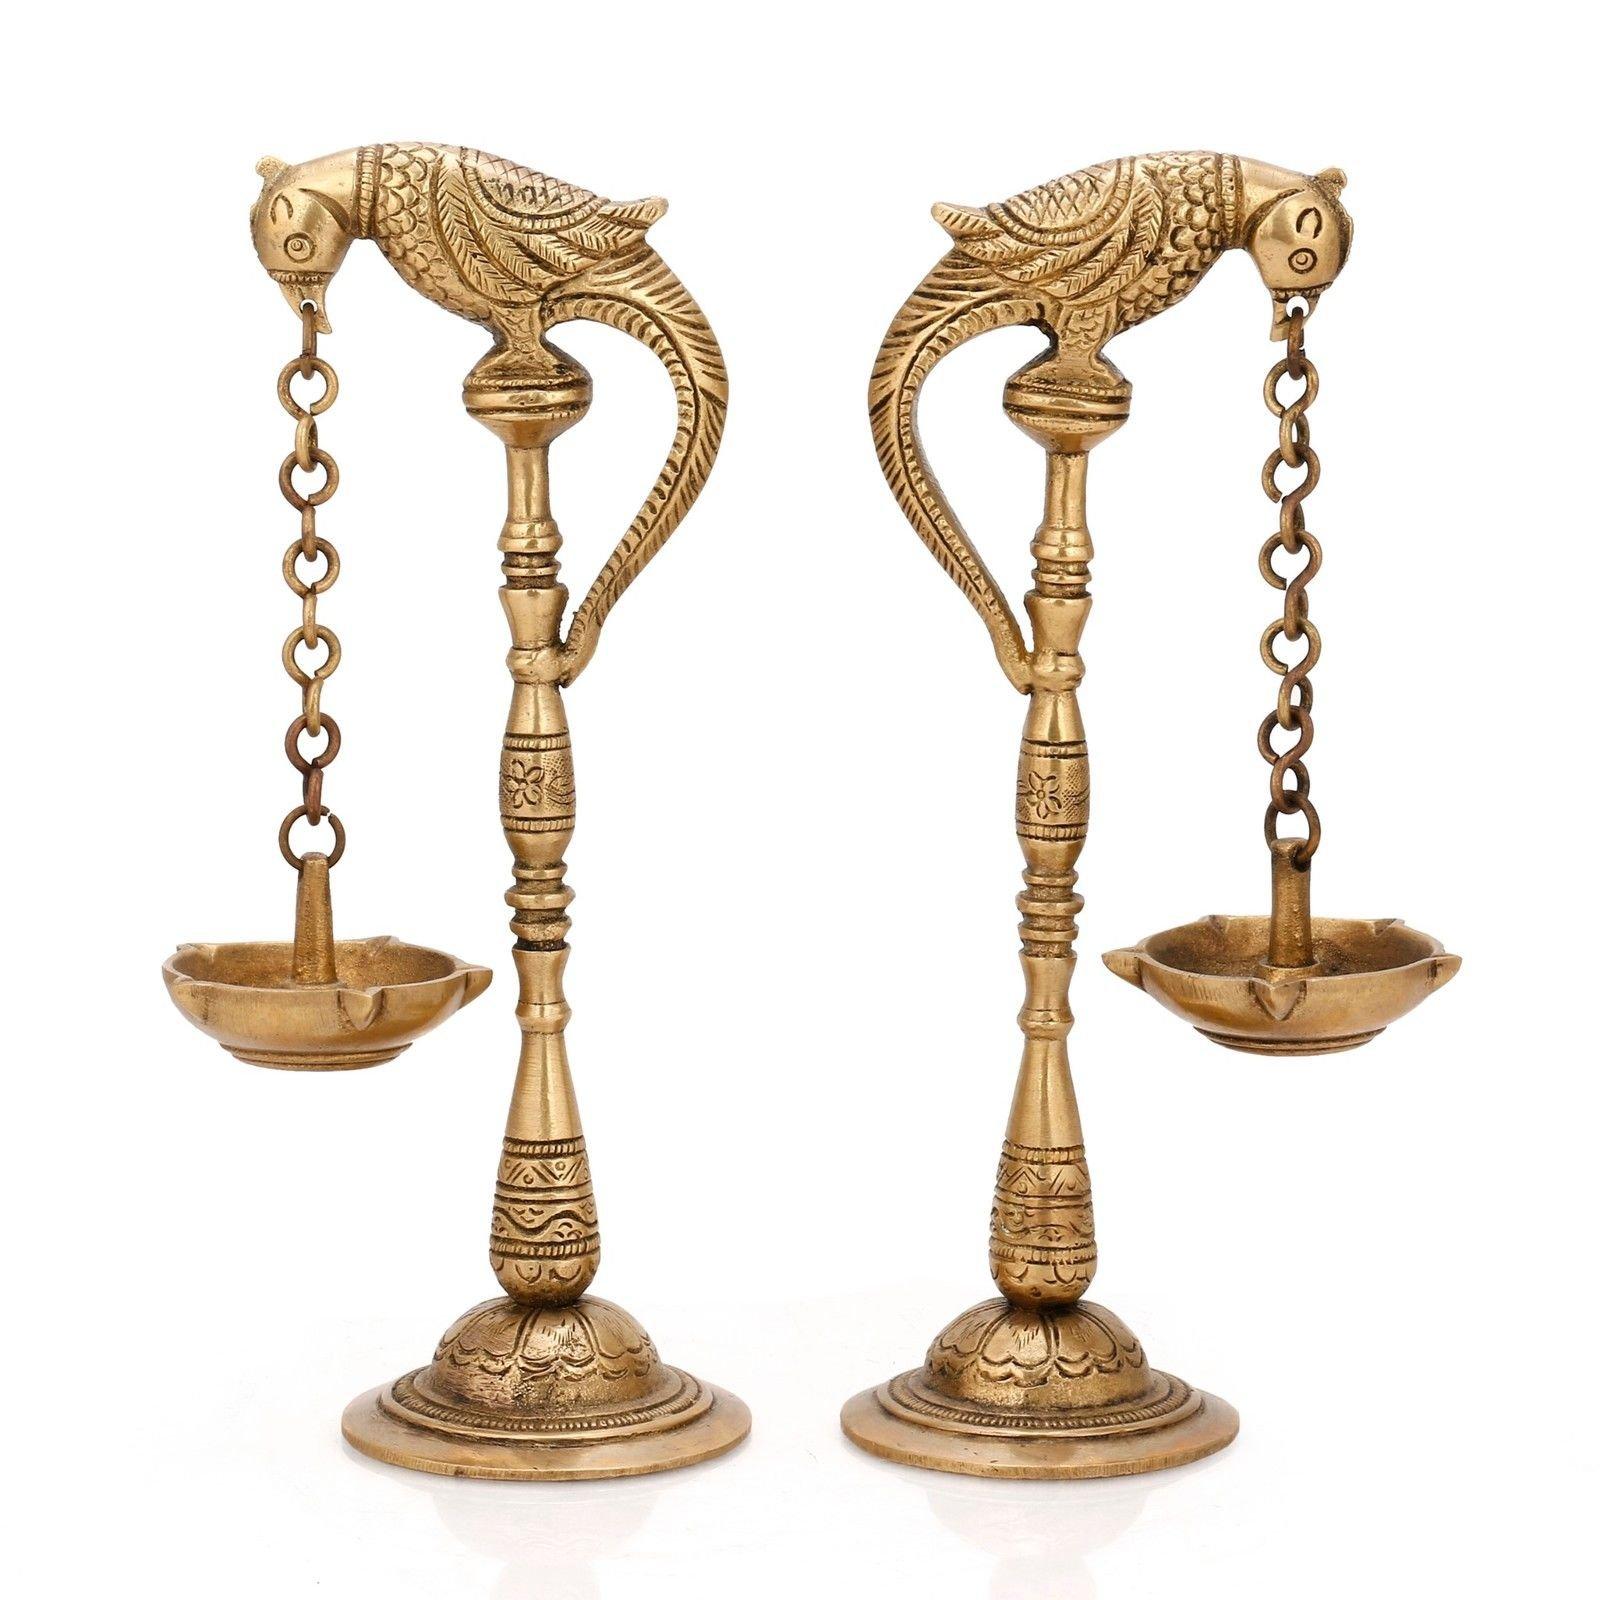 Pair of Bird Diya Oil Lamp Stand Holder Brass Hindu Religious Puja Art Fengshui Gifts